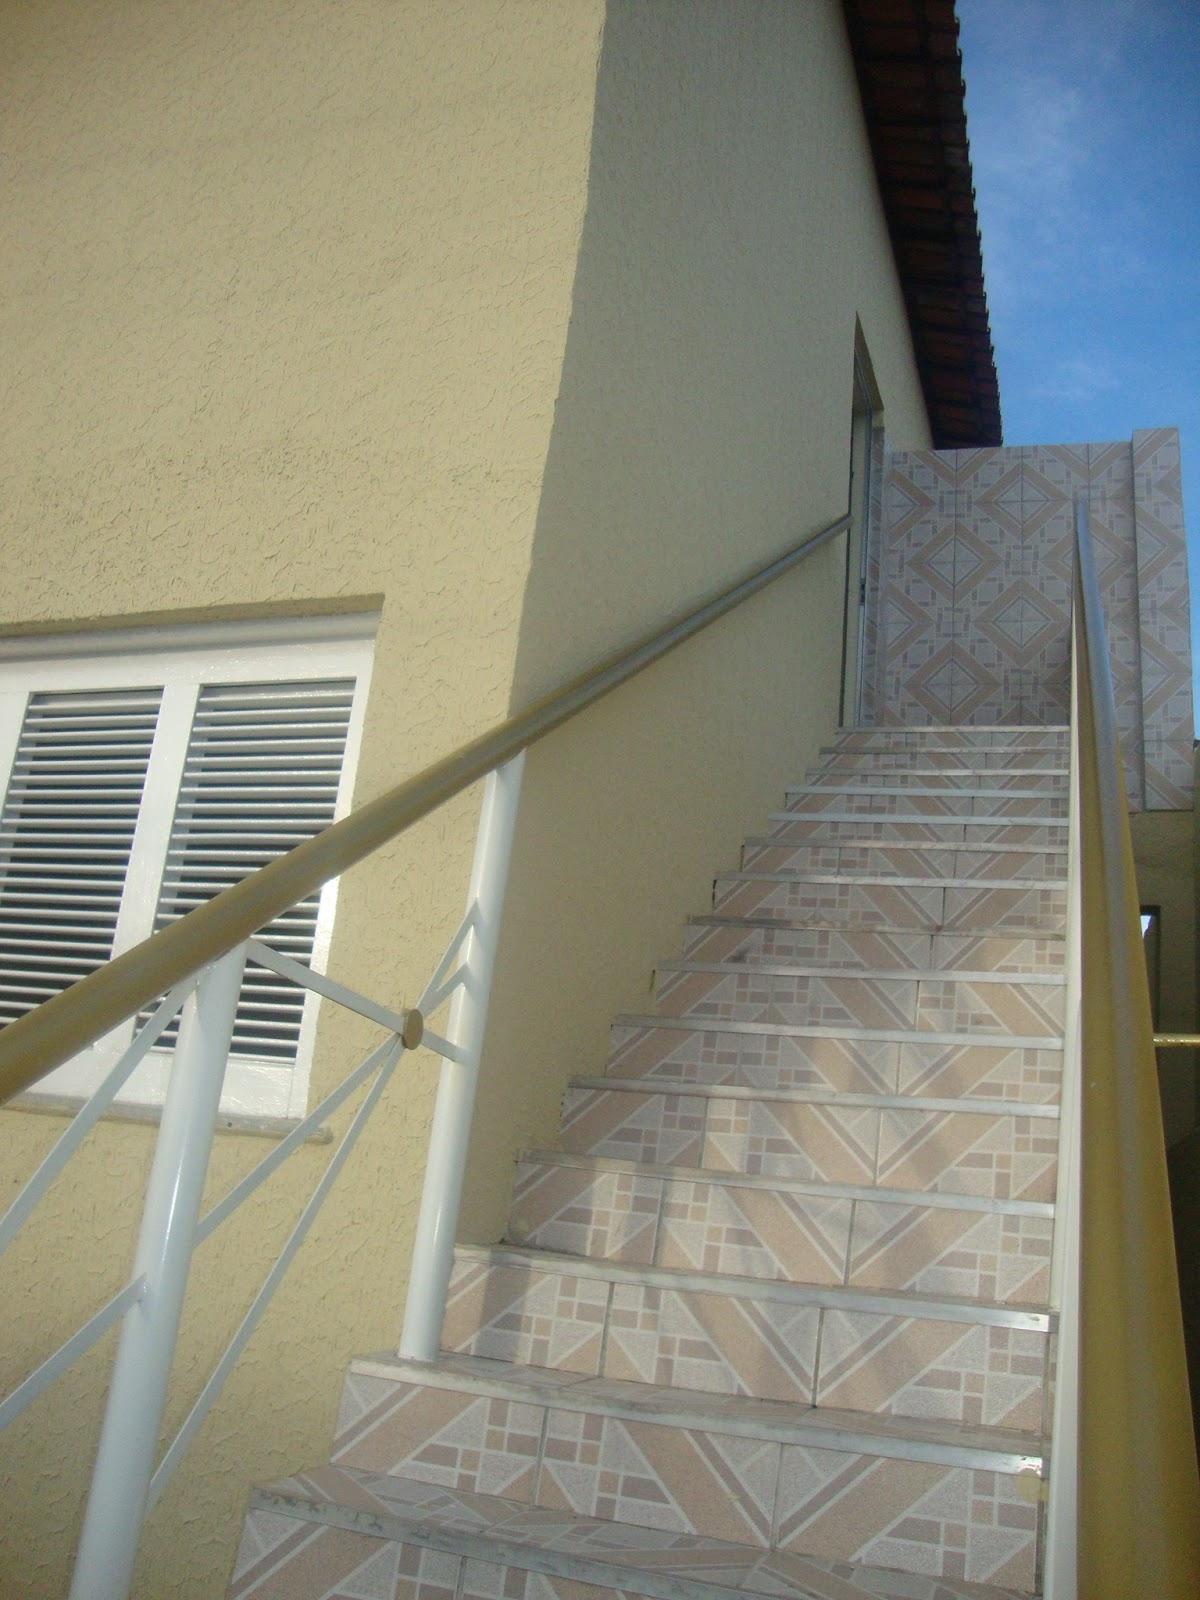 Visão da escada de entrada do pensionato Lar das Meninax (Fortaleza-CE)